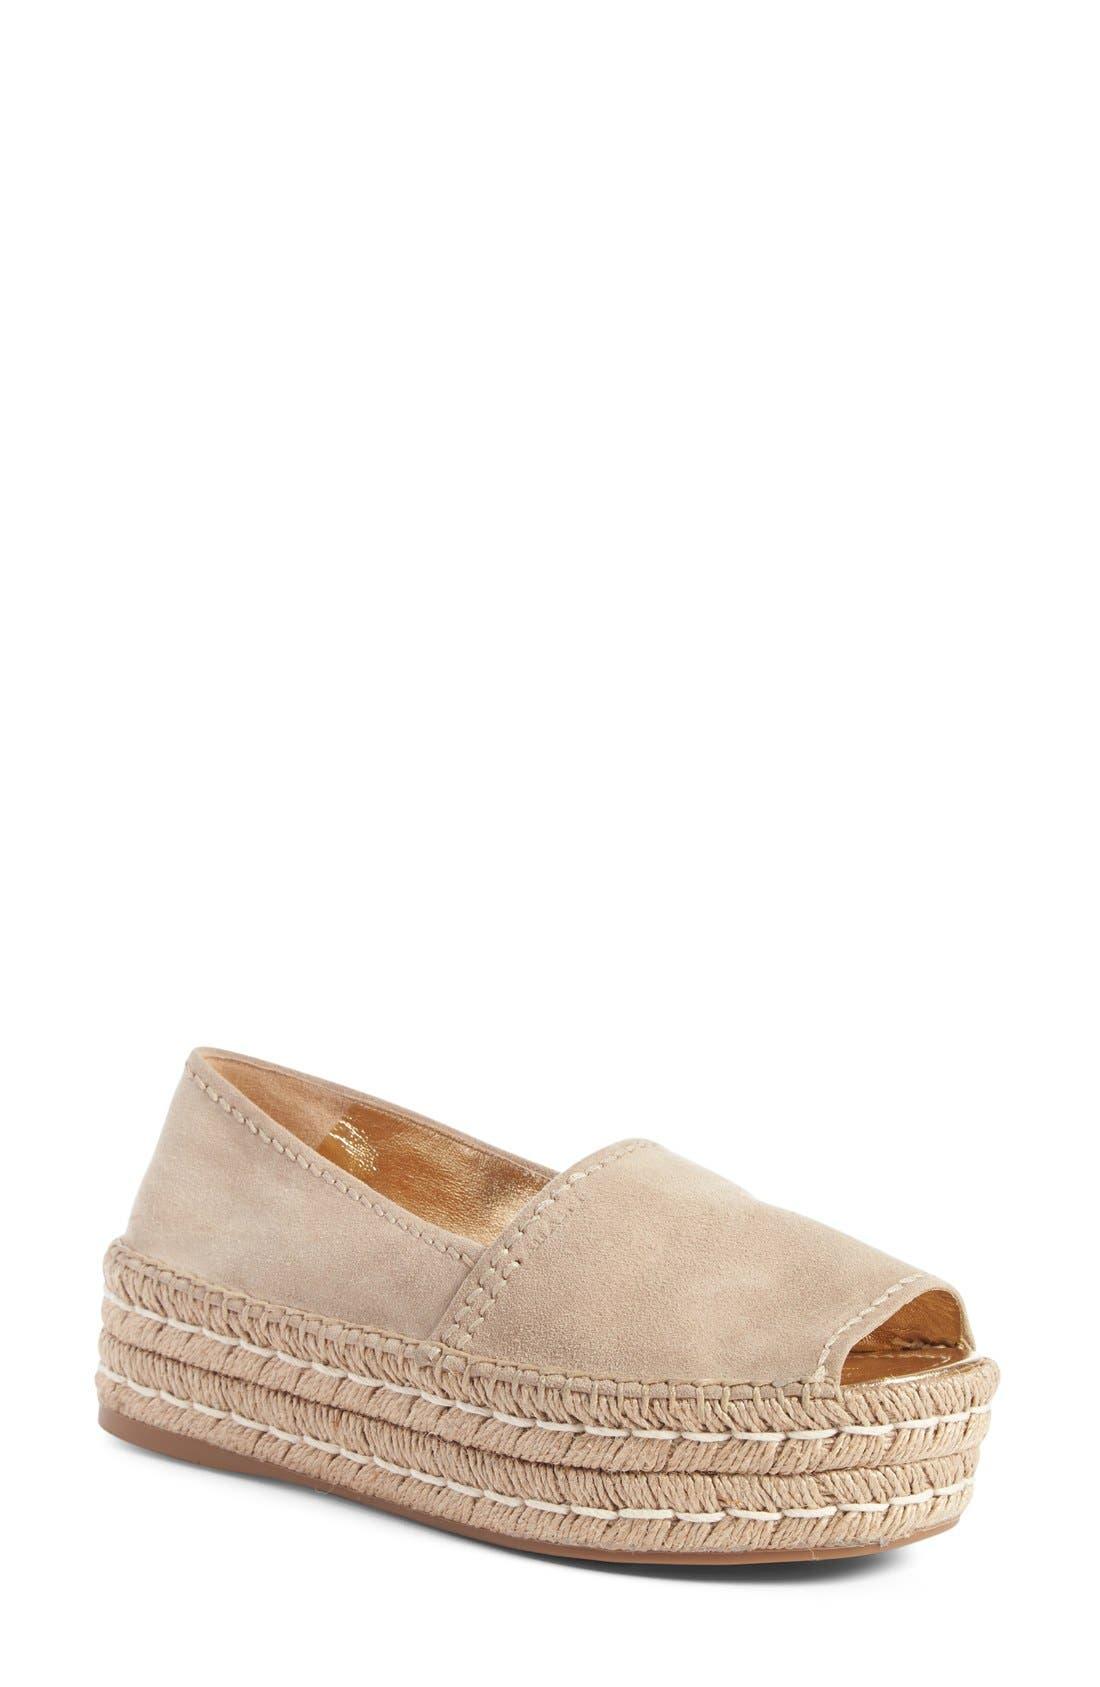 Prada Peep Toe Leather Espadrille (Women)